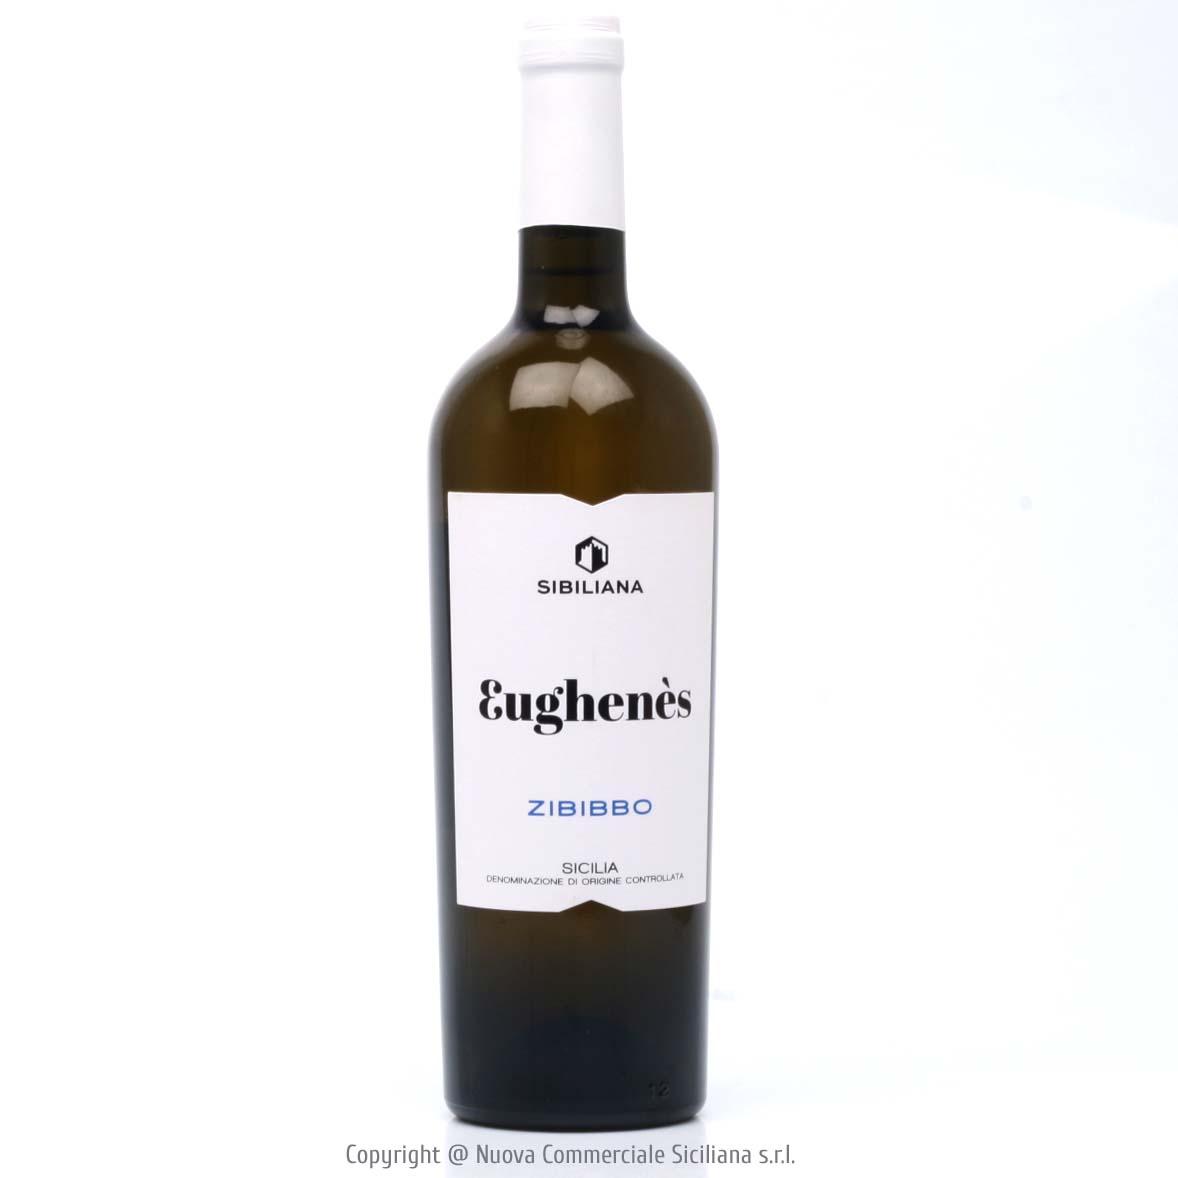 EUGHENES ZIBIBBO SICILIA DOC 2020 - SICILIA/BIANCO CL 75